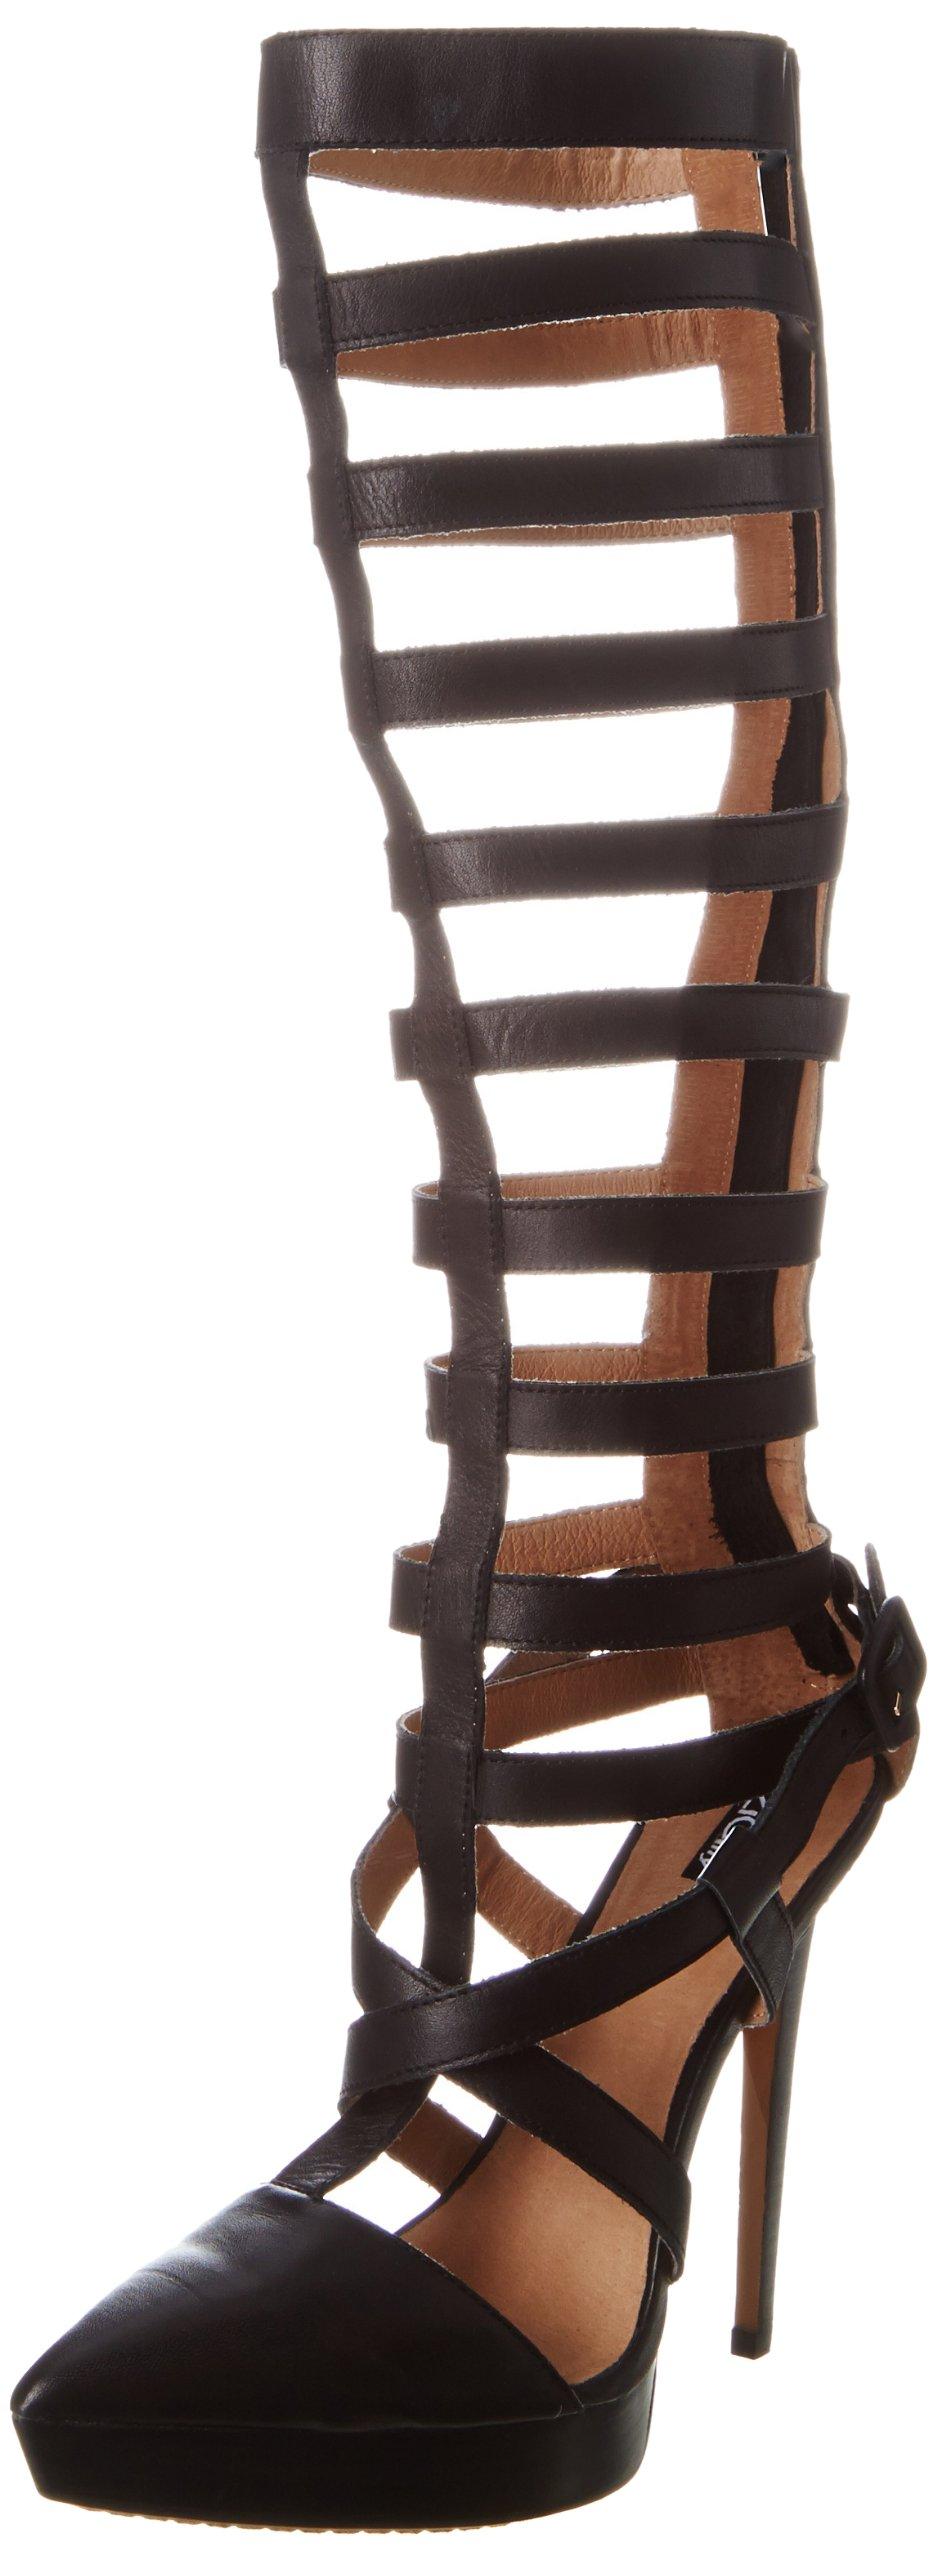 ZiGiny Women's Proxy Dress Sandal,Black leather,8 M US